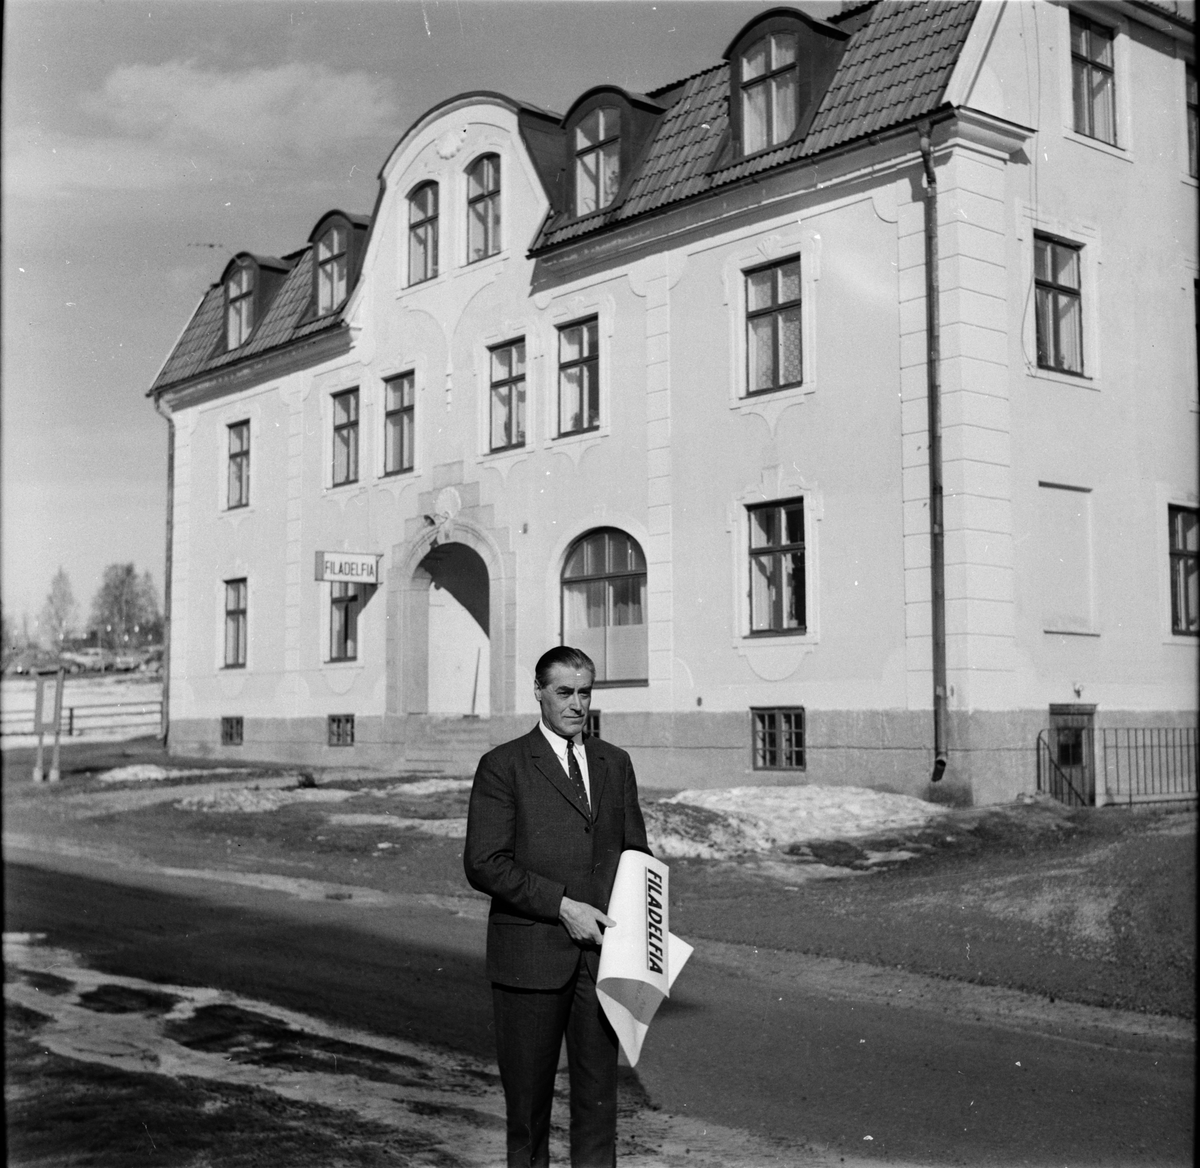 Ljusdal, Filadelfia, Pastor Dahlberg, 28 Mars 1968